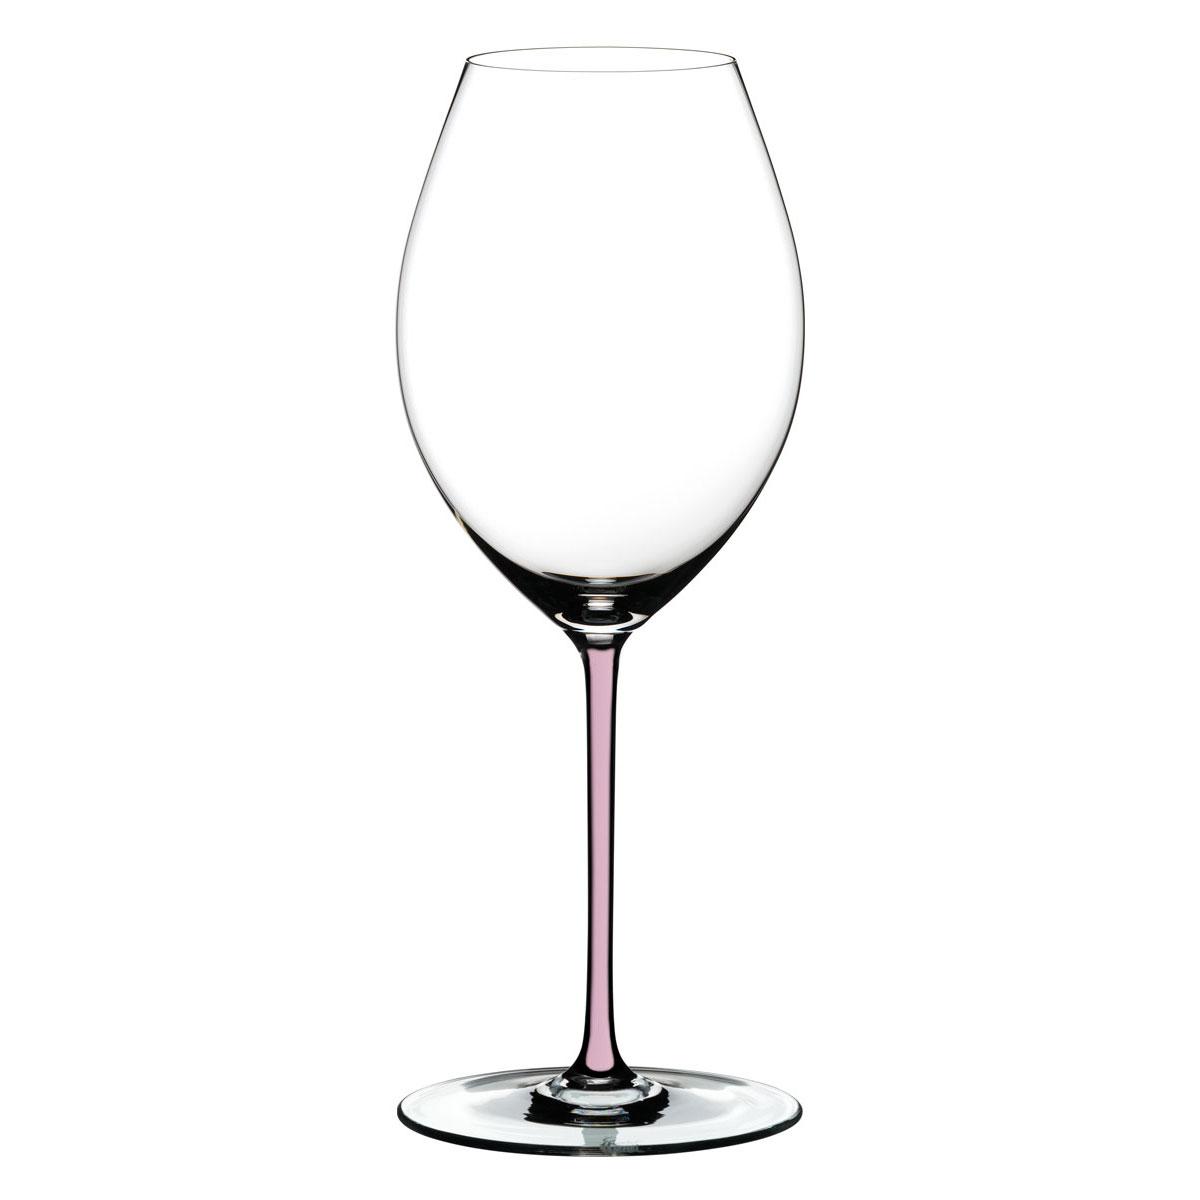 Riedel Fatto A Mano Old World Syrah Wine Glass, Pink